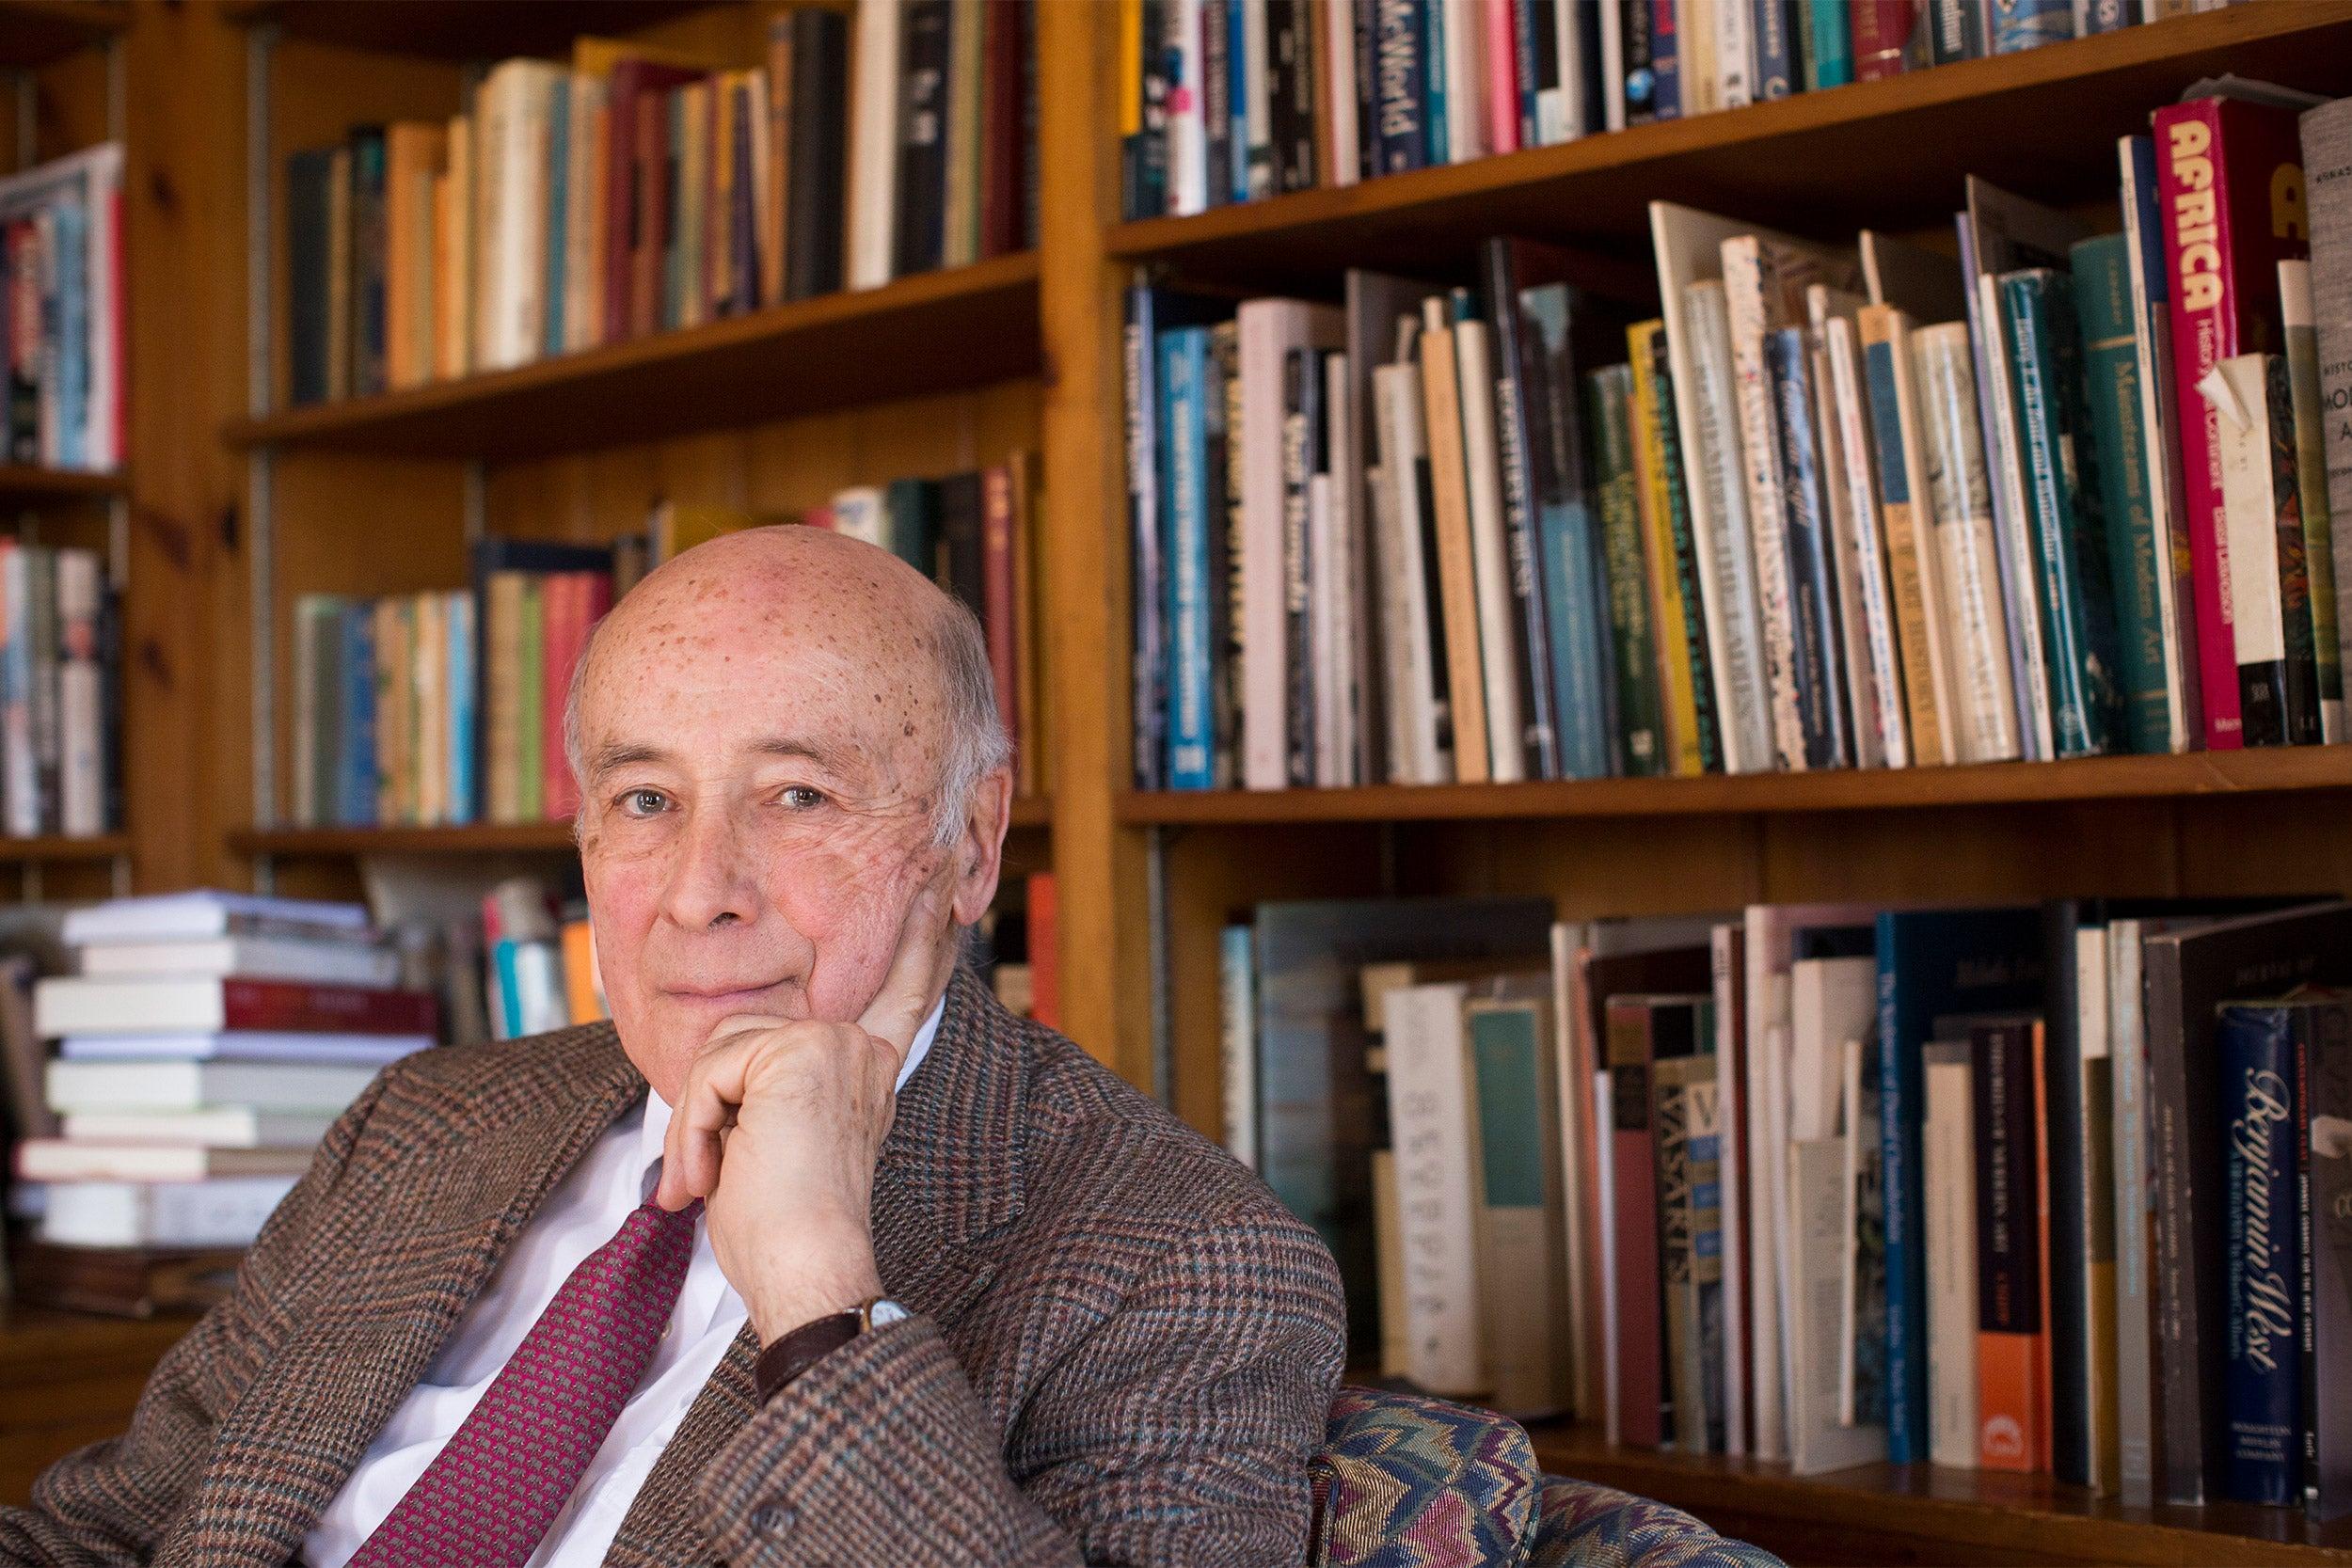 Joseph Nye in his office.